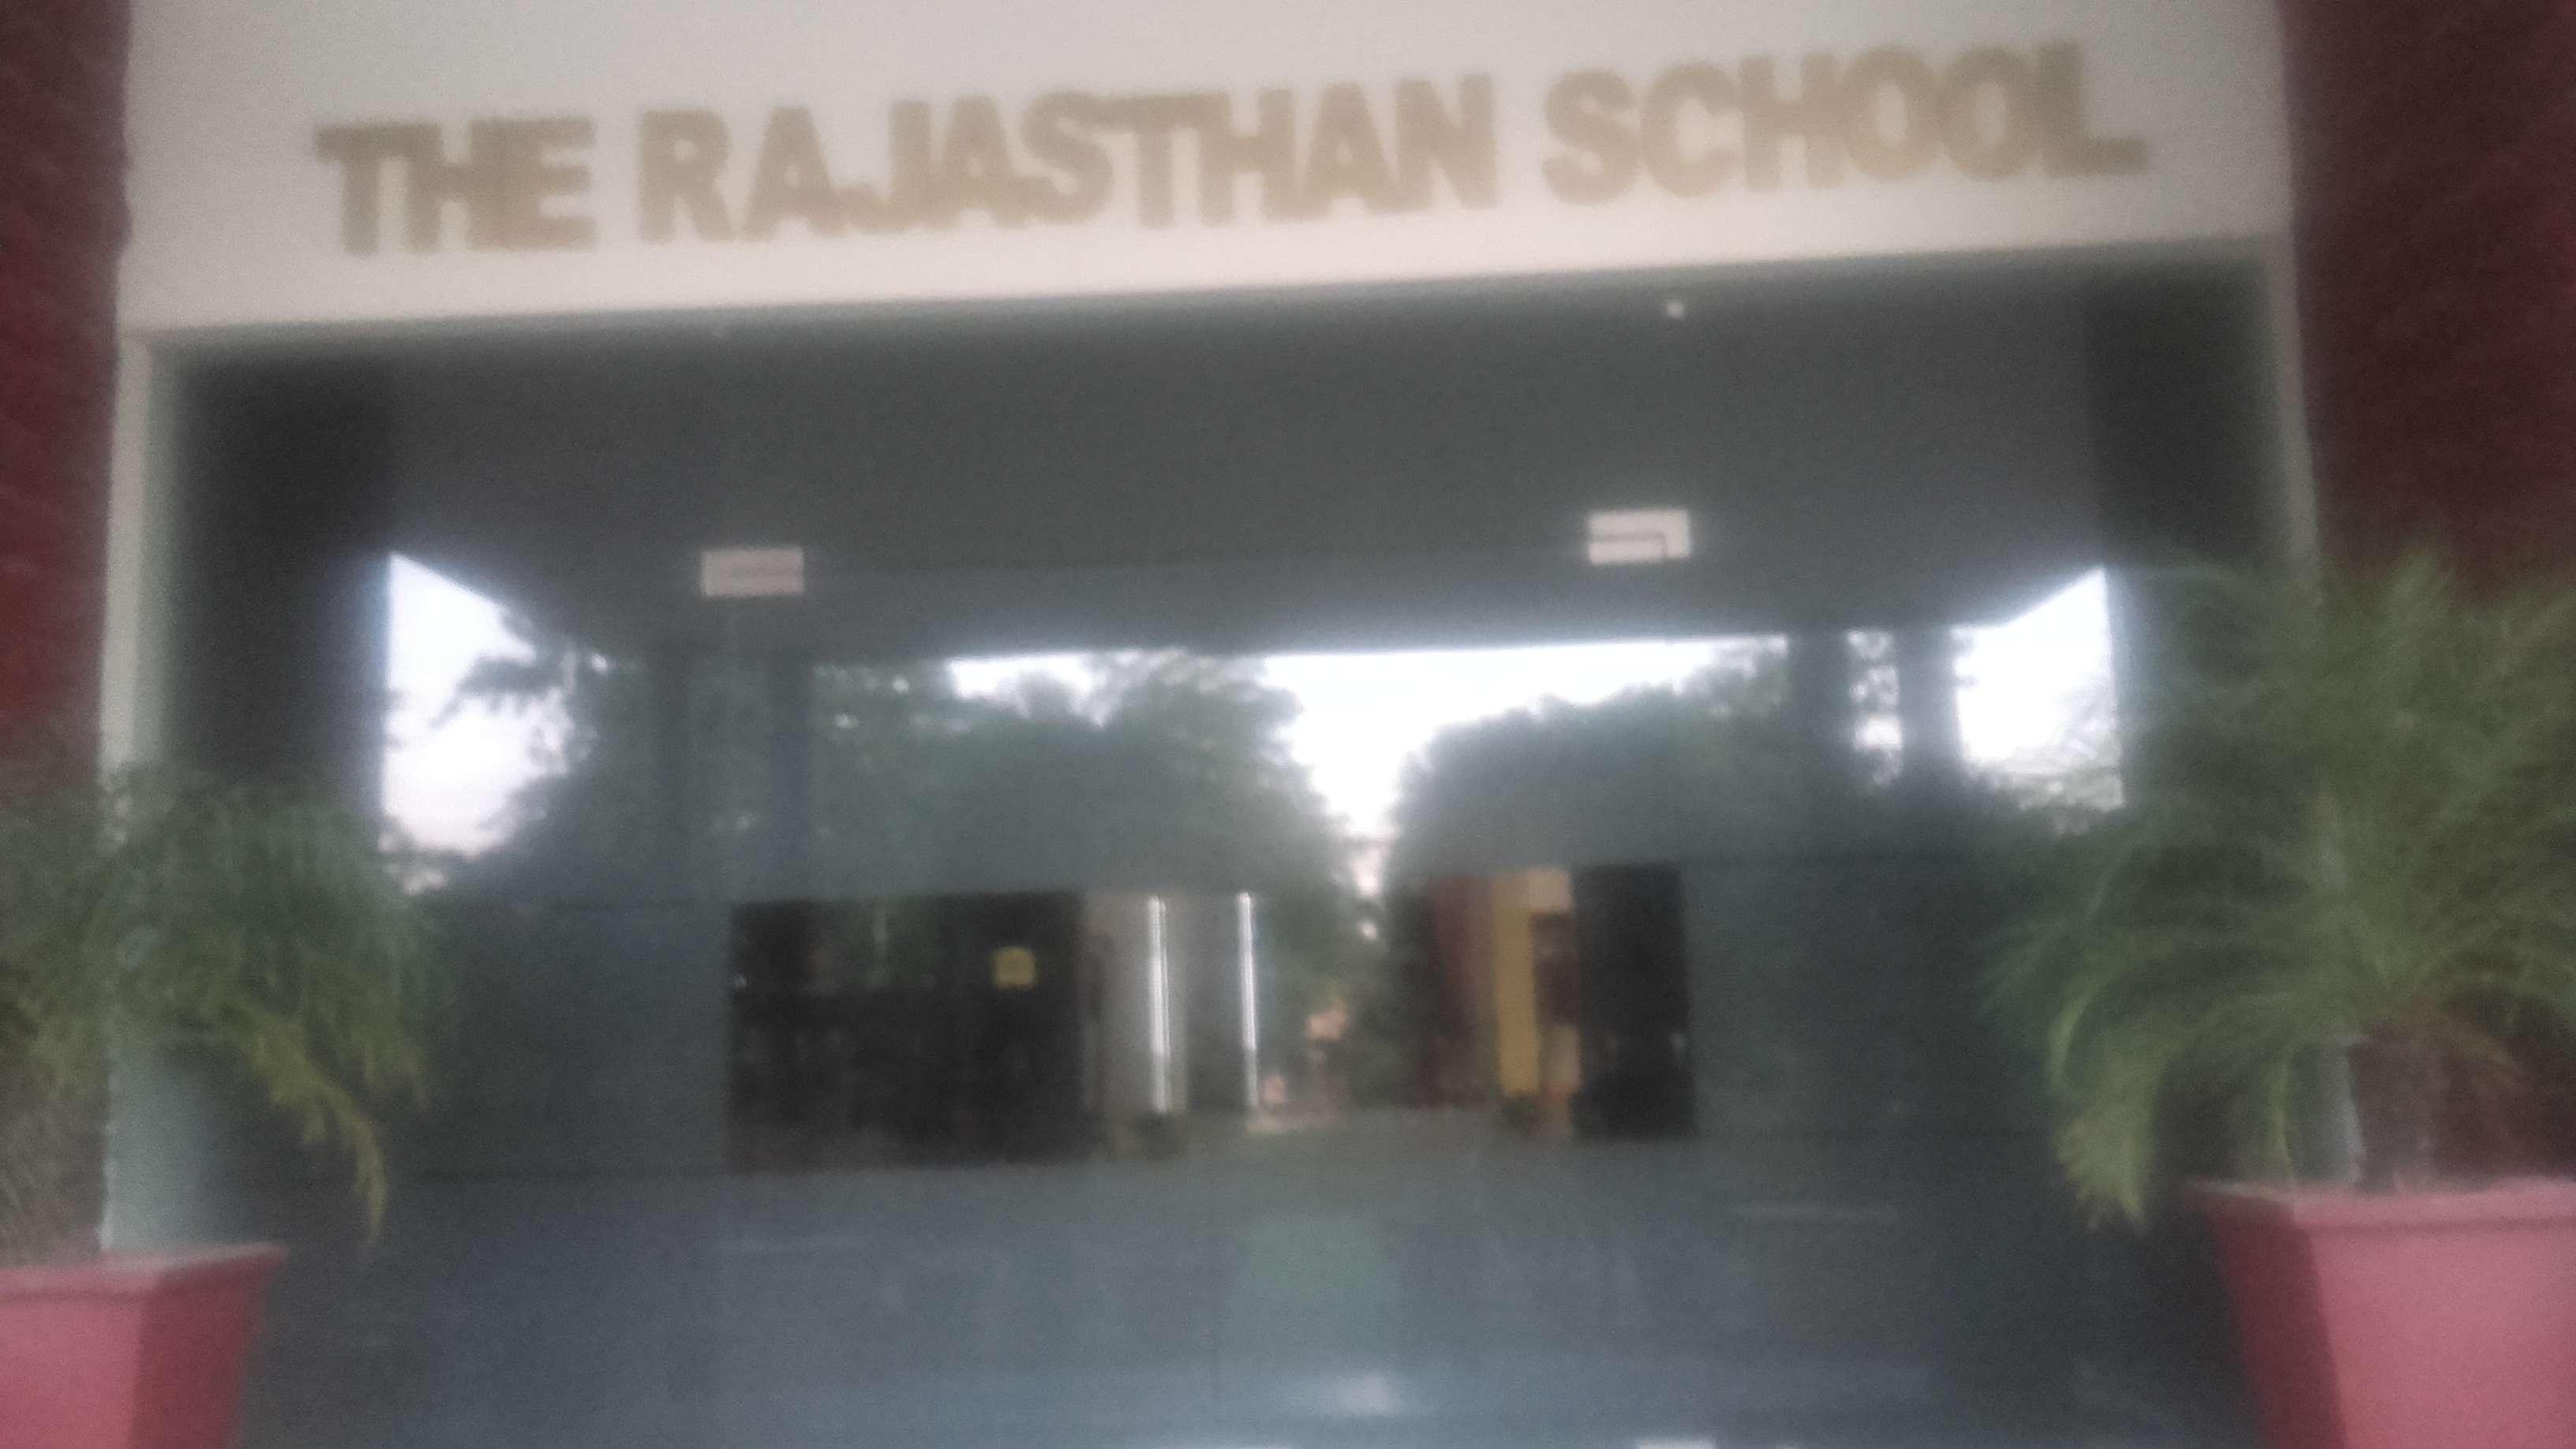 THE RAJASTHAN SCHOOL NH 8 KOTPUTLI DISTT JAIPUR RAJASTHAN 1730293